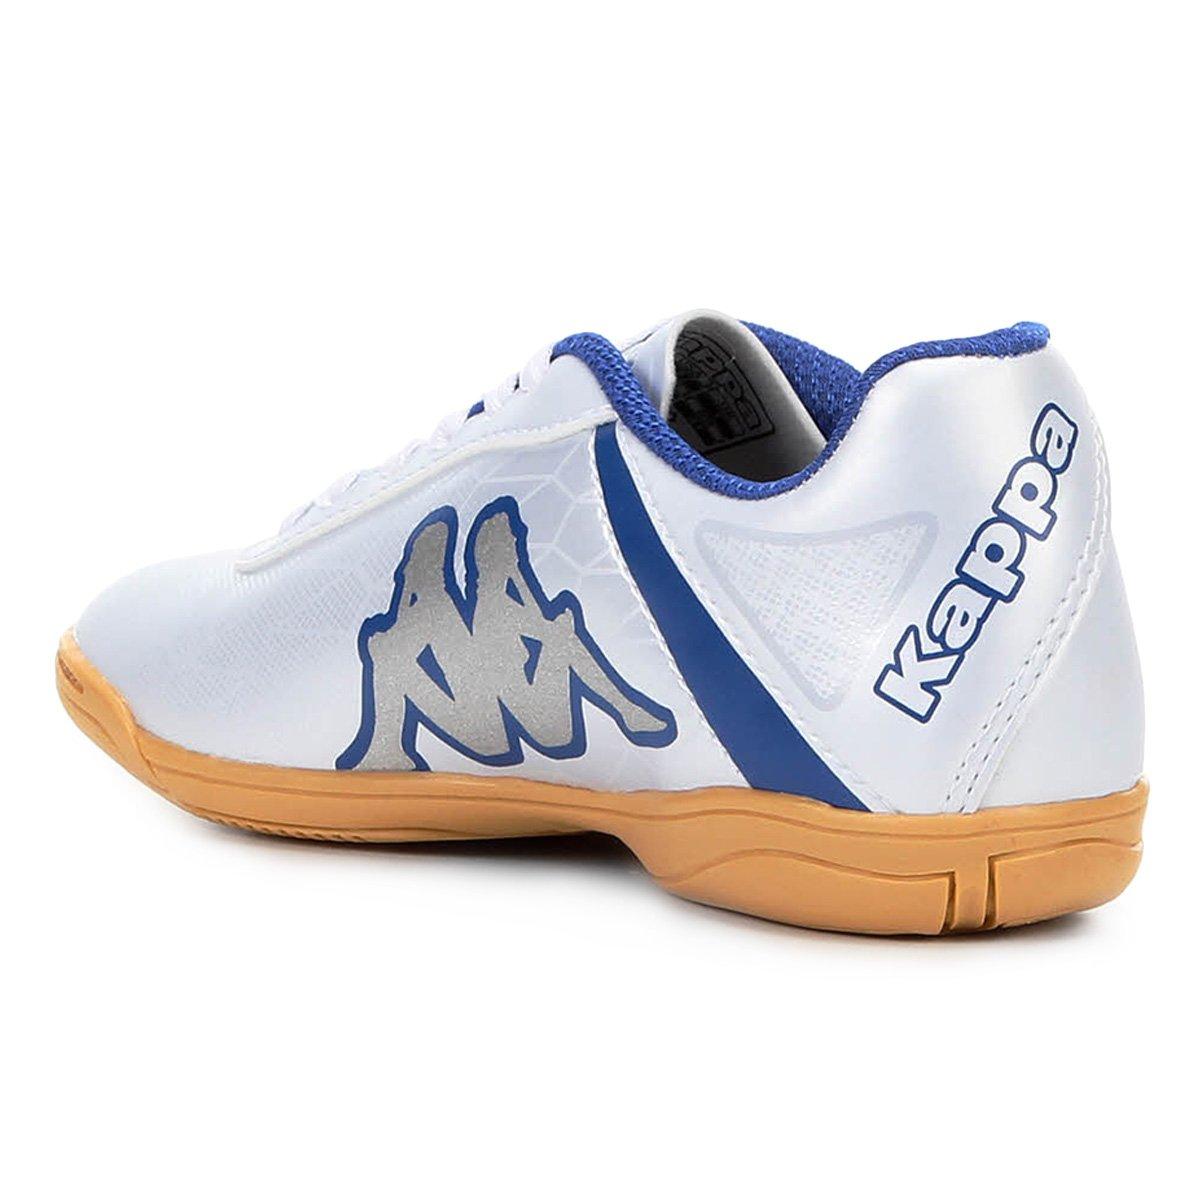 dae6aa5bf2 Chuteira Infantil Futsal Kappa Torpedo - Branco e Azul